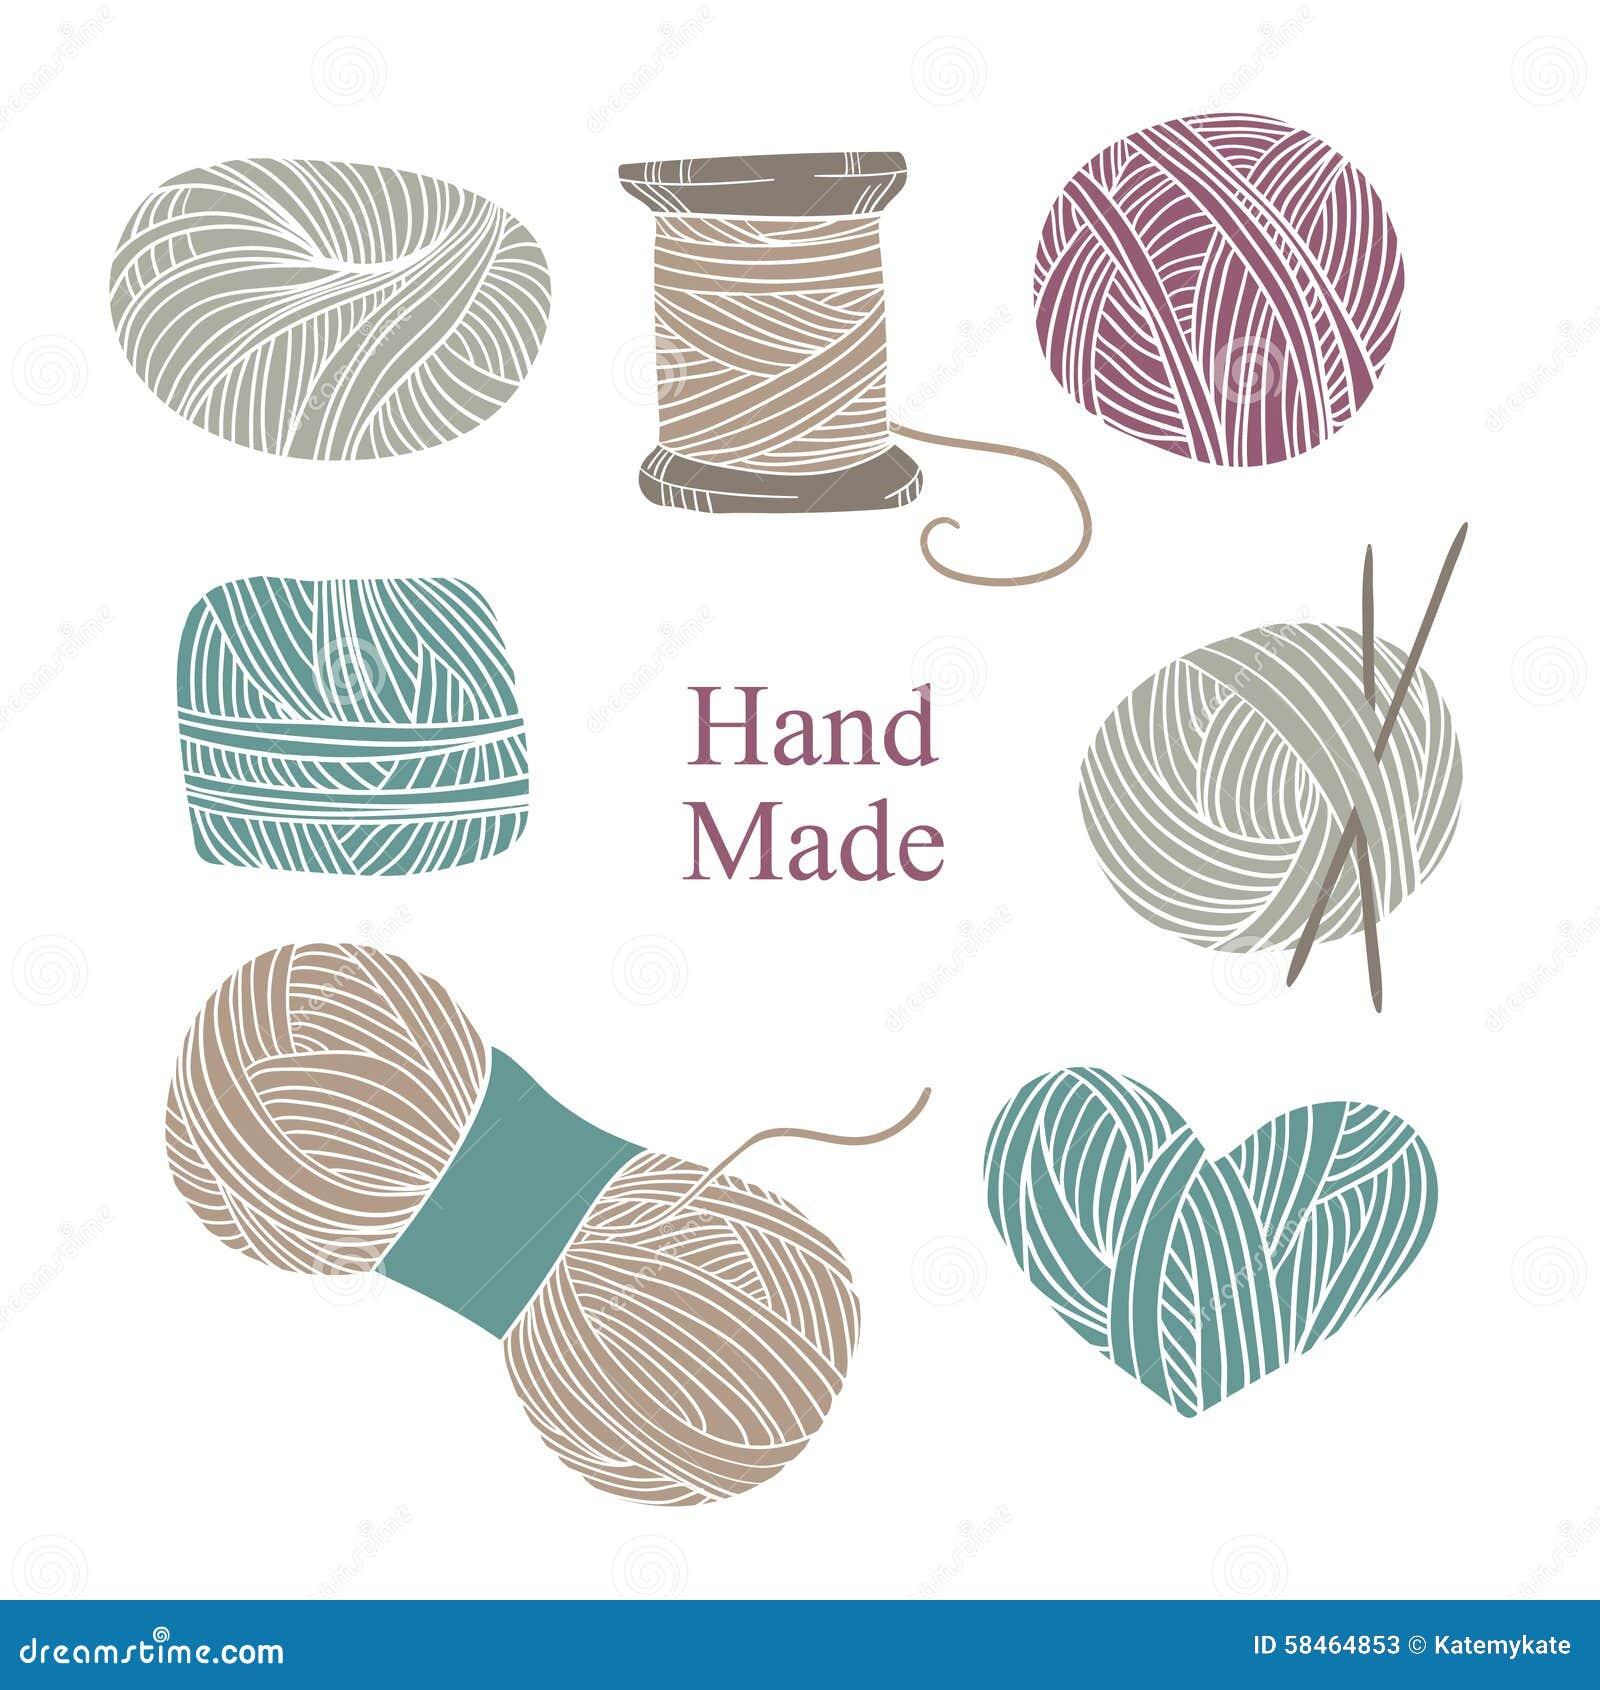 Knitting Hands Clipart : Hand drawn vector vintage illustration set of knitting